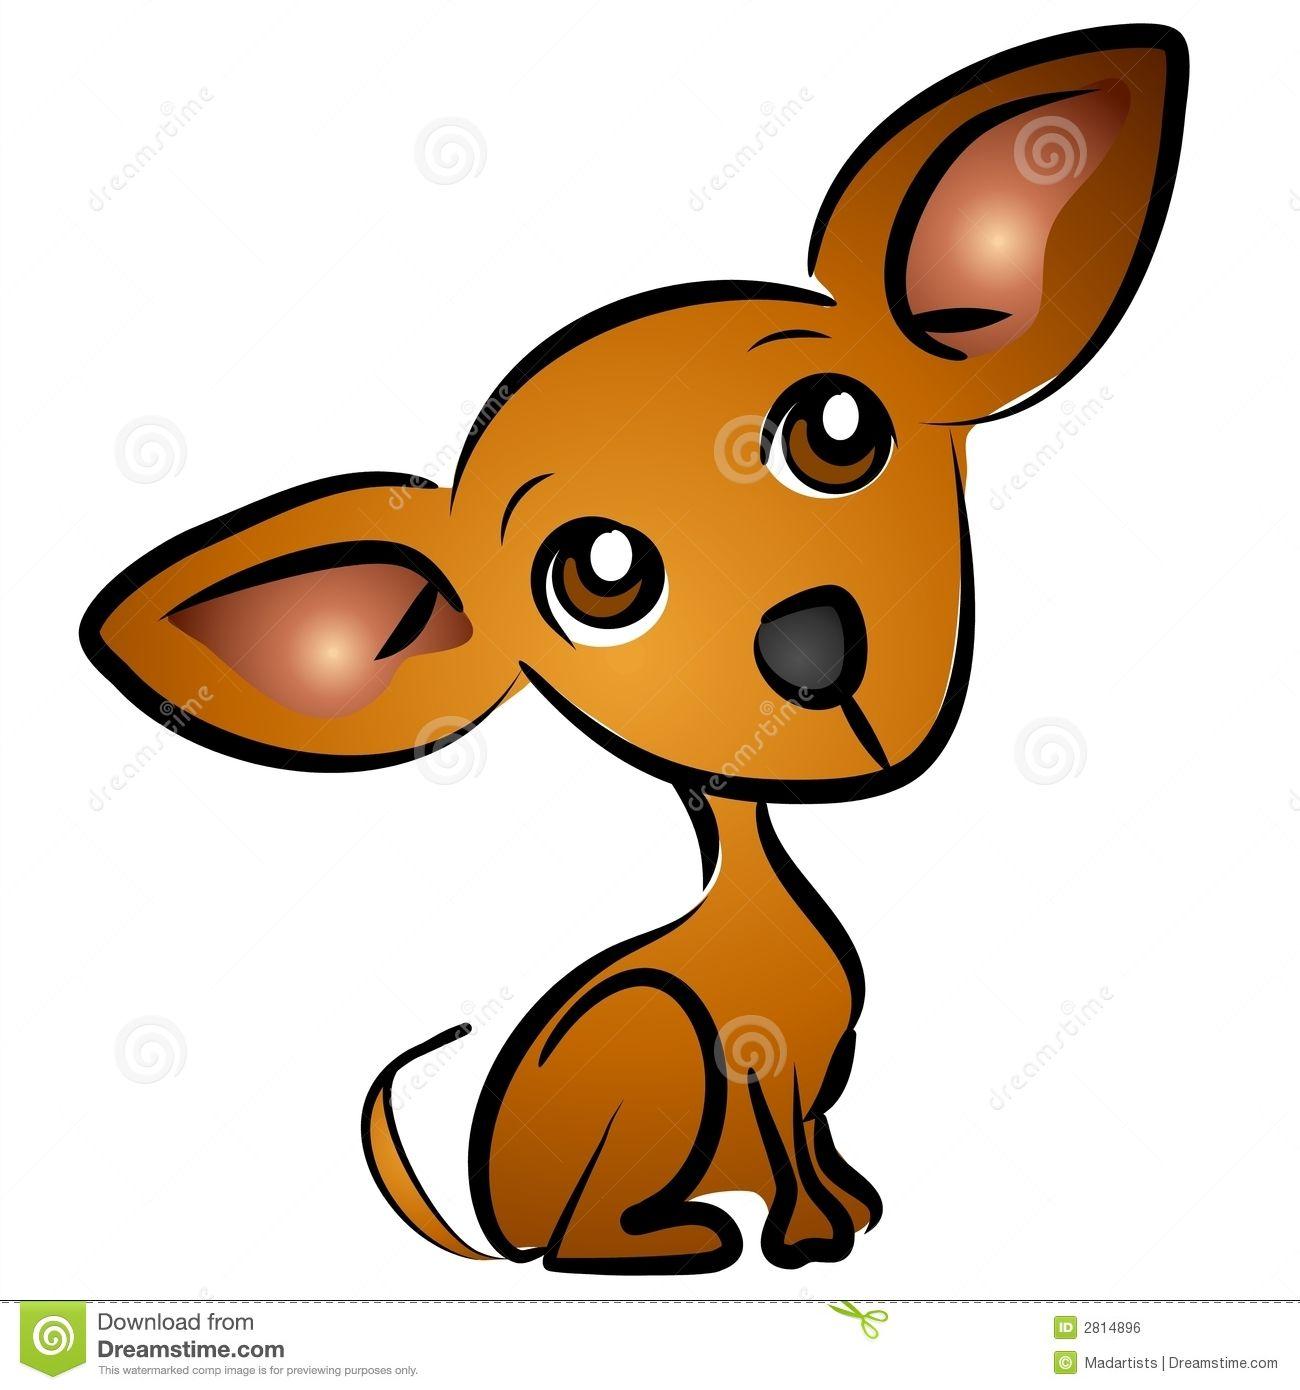 Chihuahua clipart sad puppy, Chihuahua sad puppy Transparent.